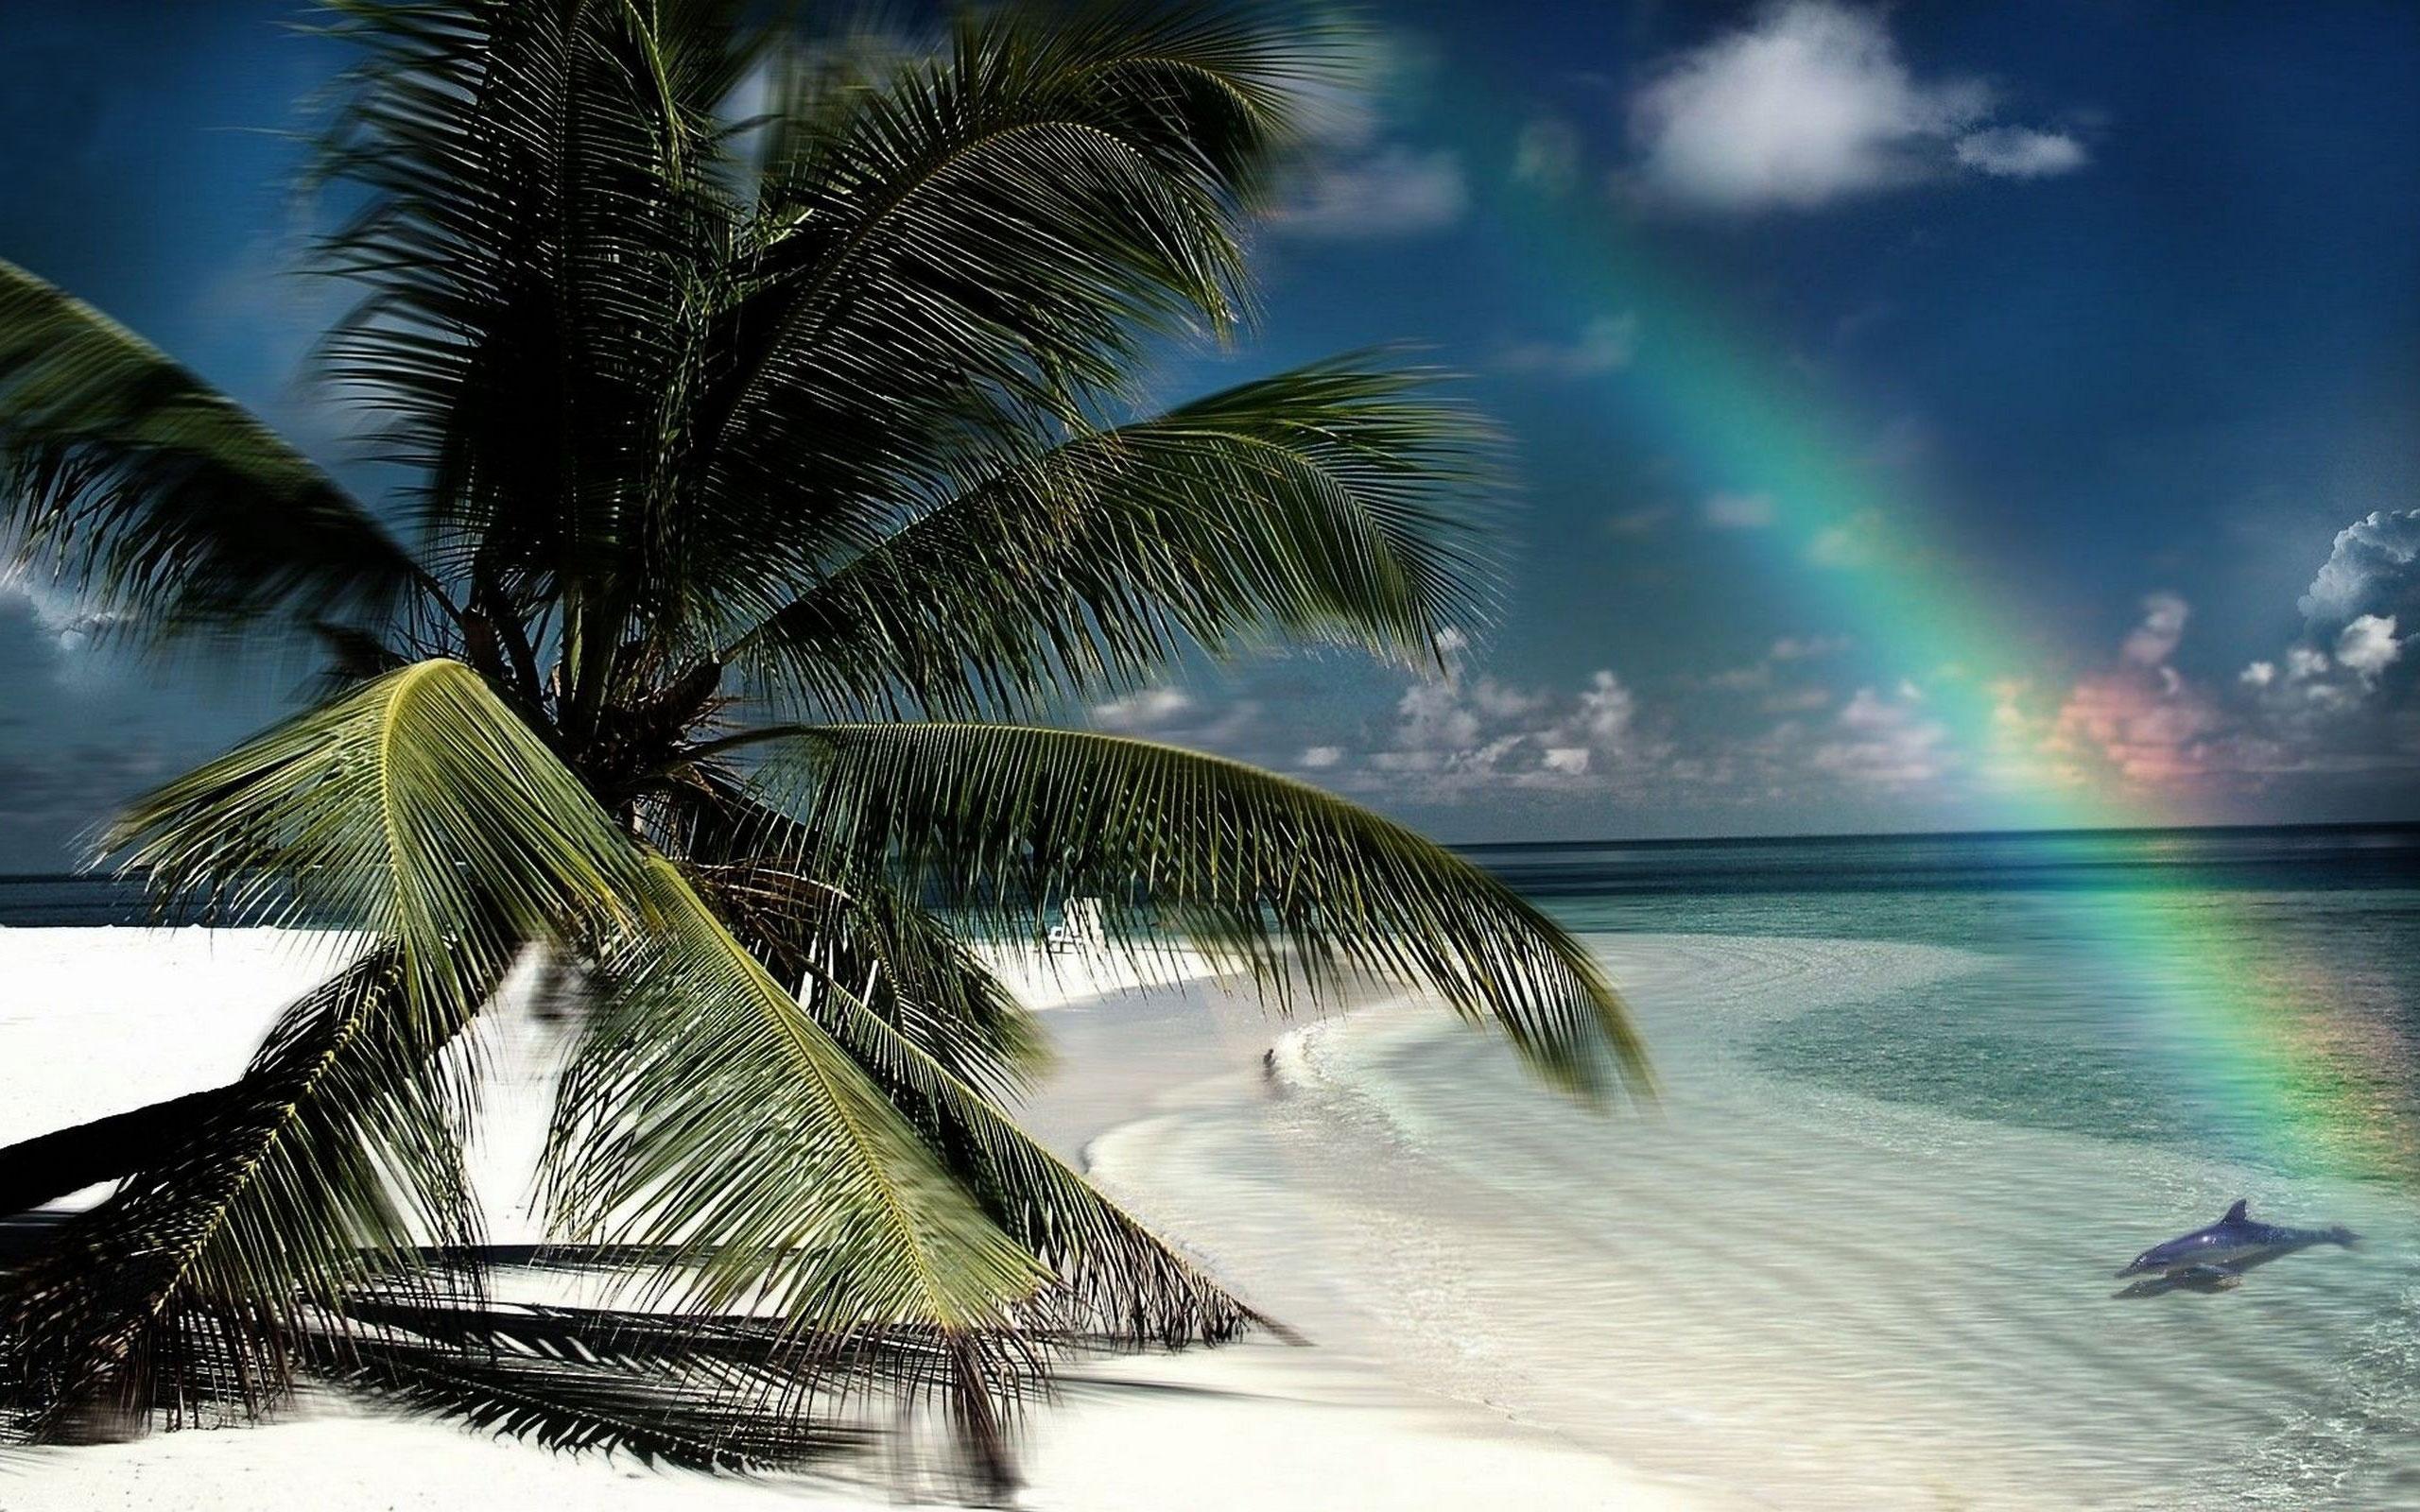 High Resolution Beach Scene Wallpaper 2560x1600